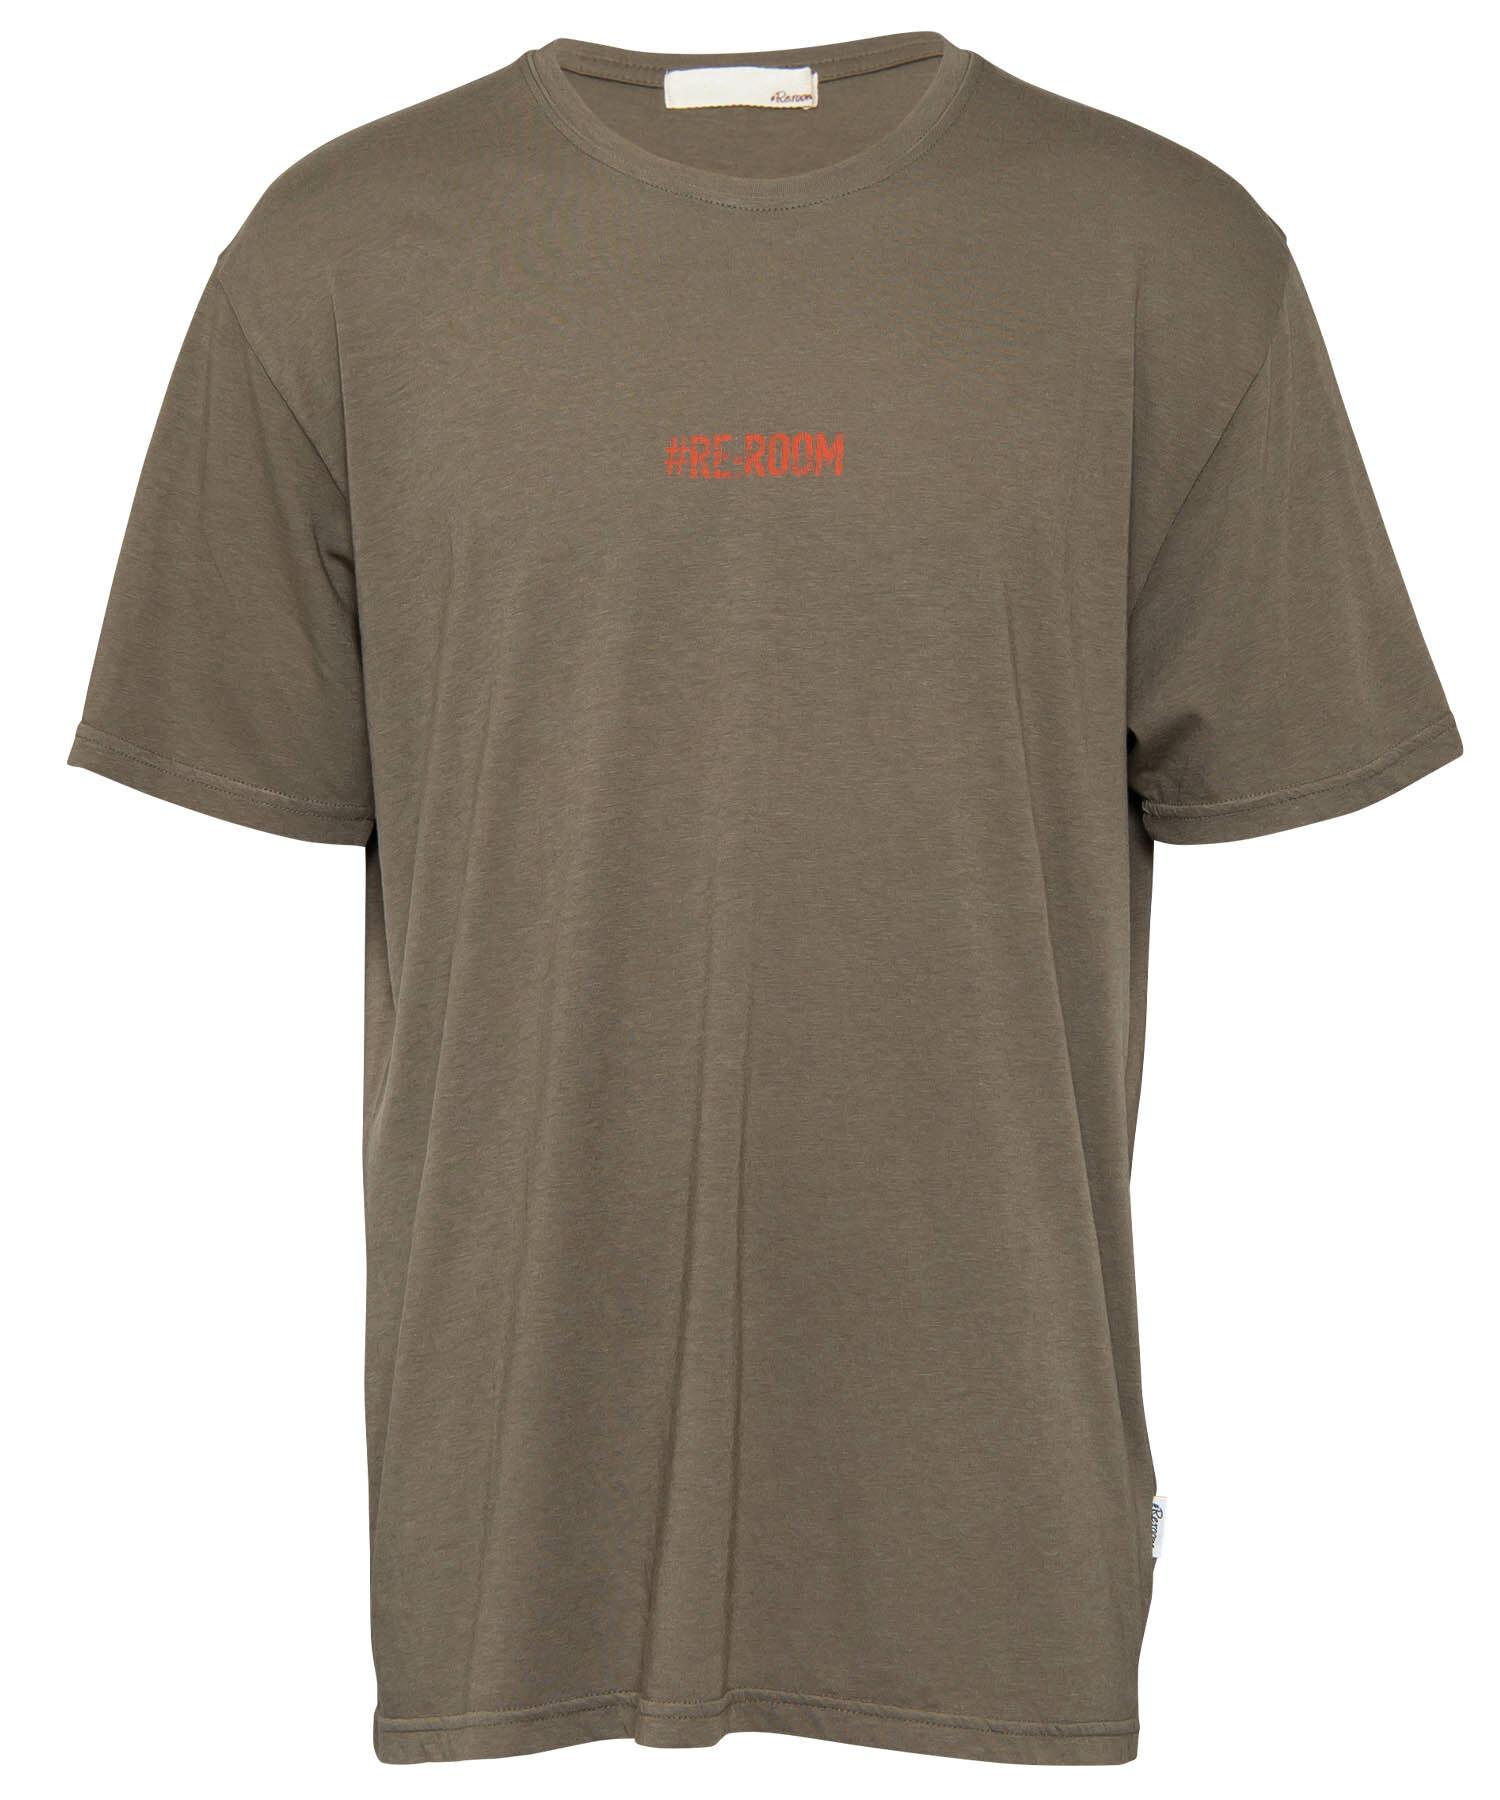 PROMOTION LOGO PRINT VINTAGE T-shirt[REC300]